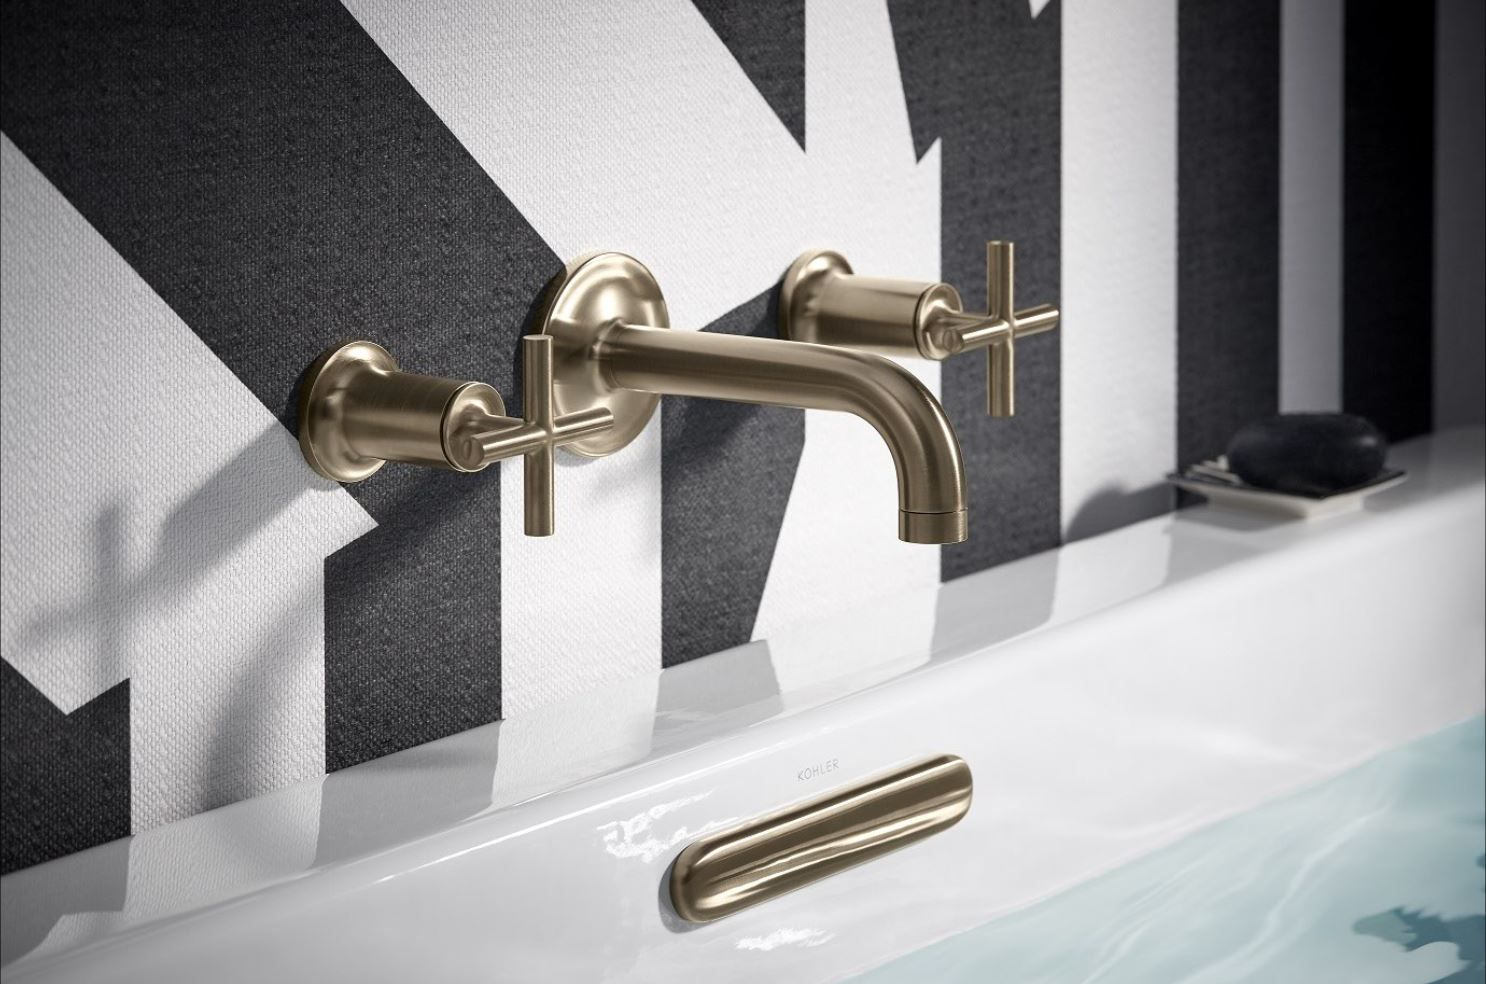 kohler purist wall mount bath filler